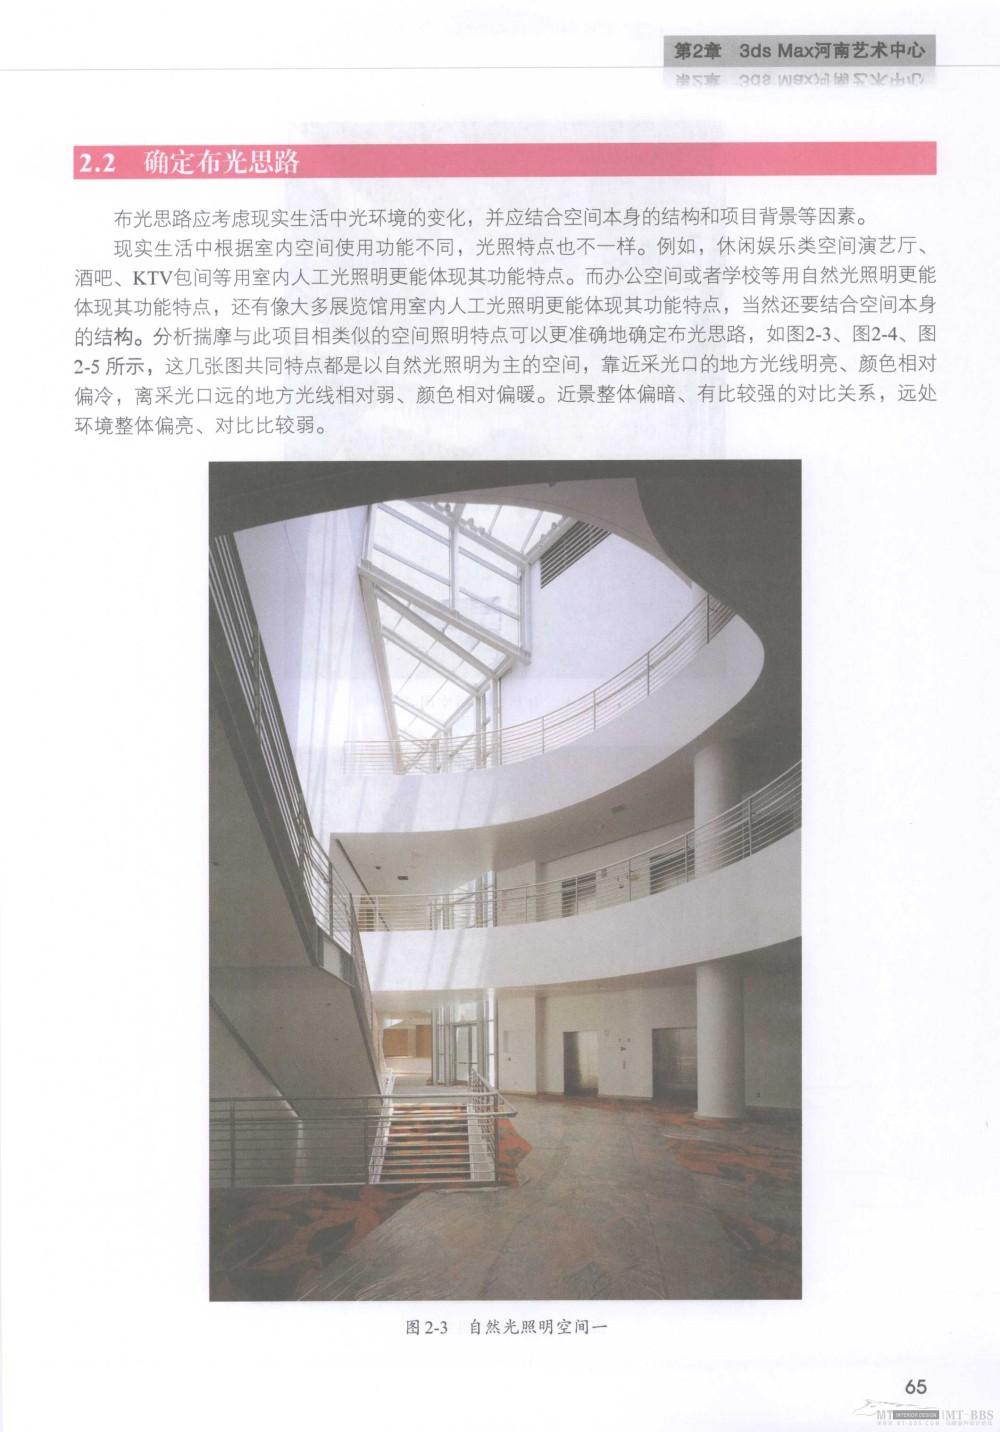 水晶石技法-3ds_Max&VRay室内空间表现_水晶石技法-3ds_Max&VRay室内空间表现_页面_071.jpg